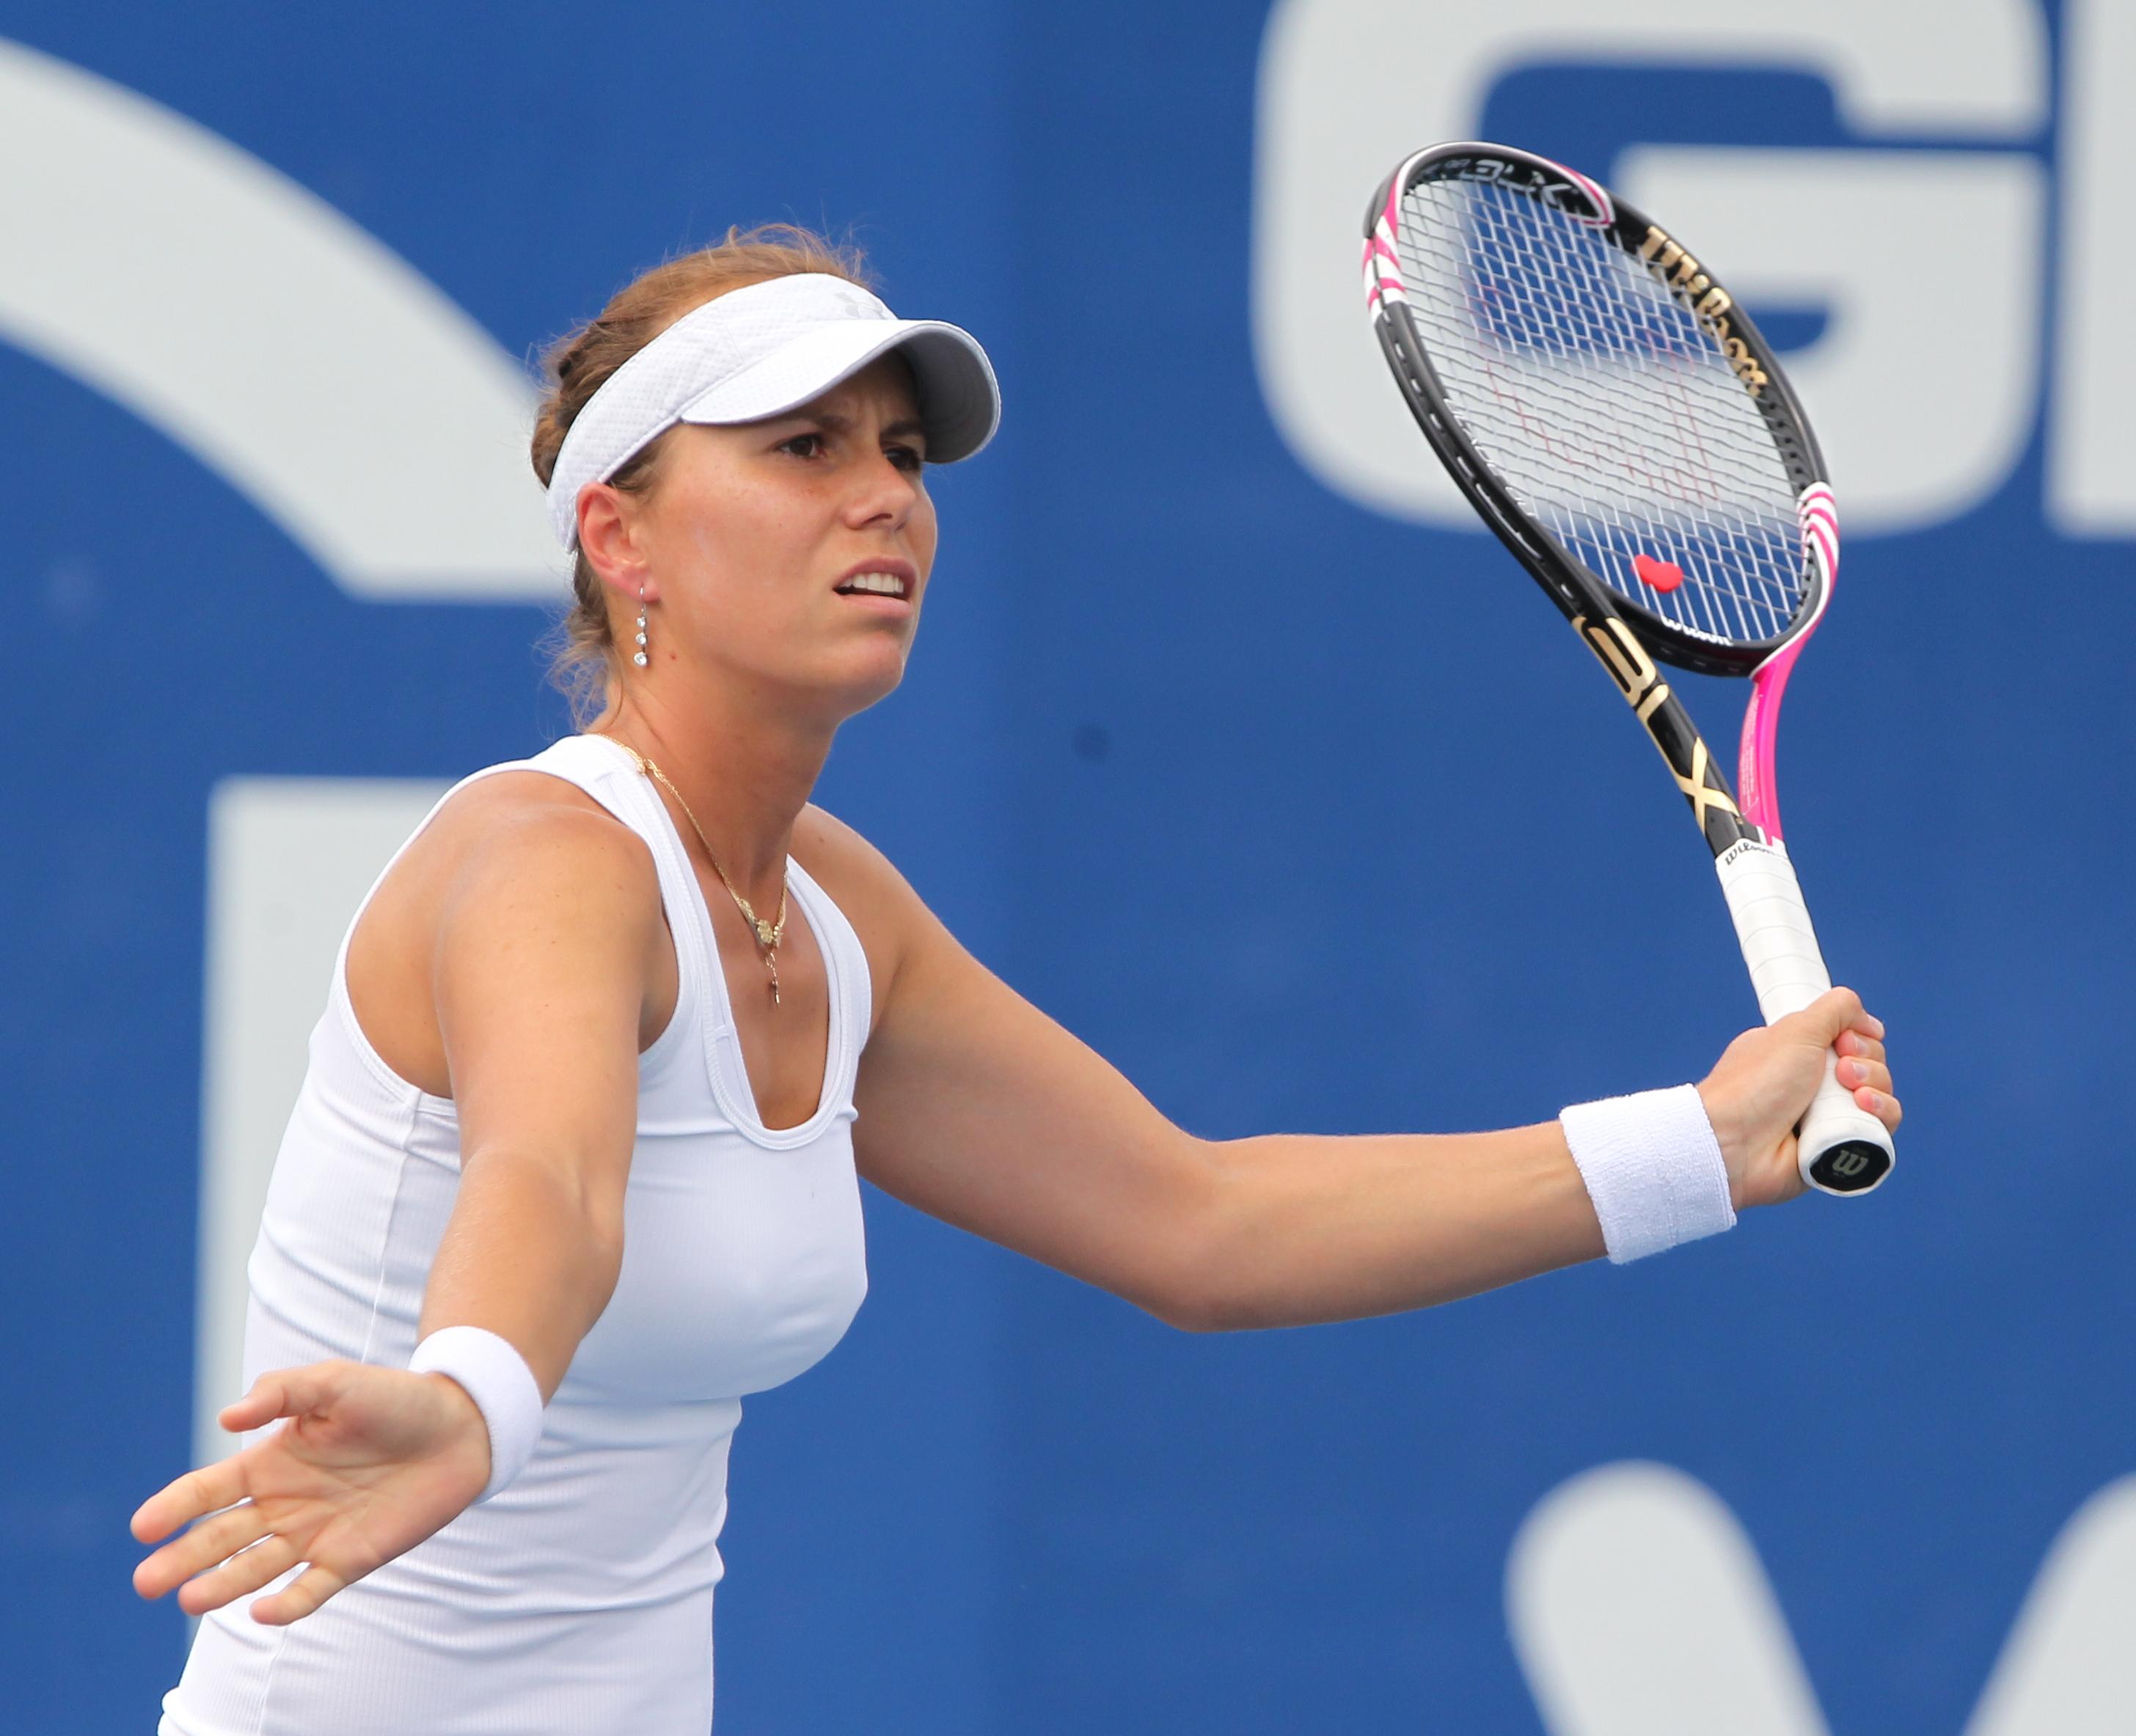 File:Varvara Lepchenko (5986705506).jpg Varvara Lepchenko Tennis